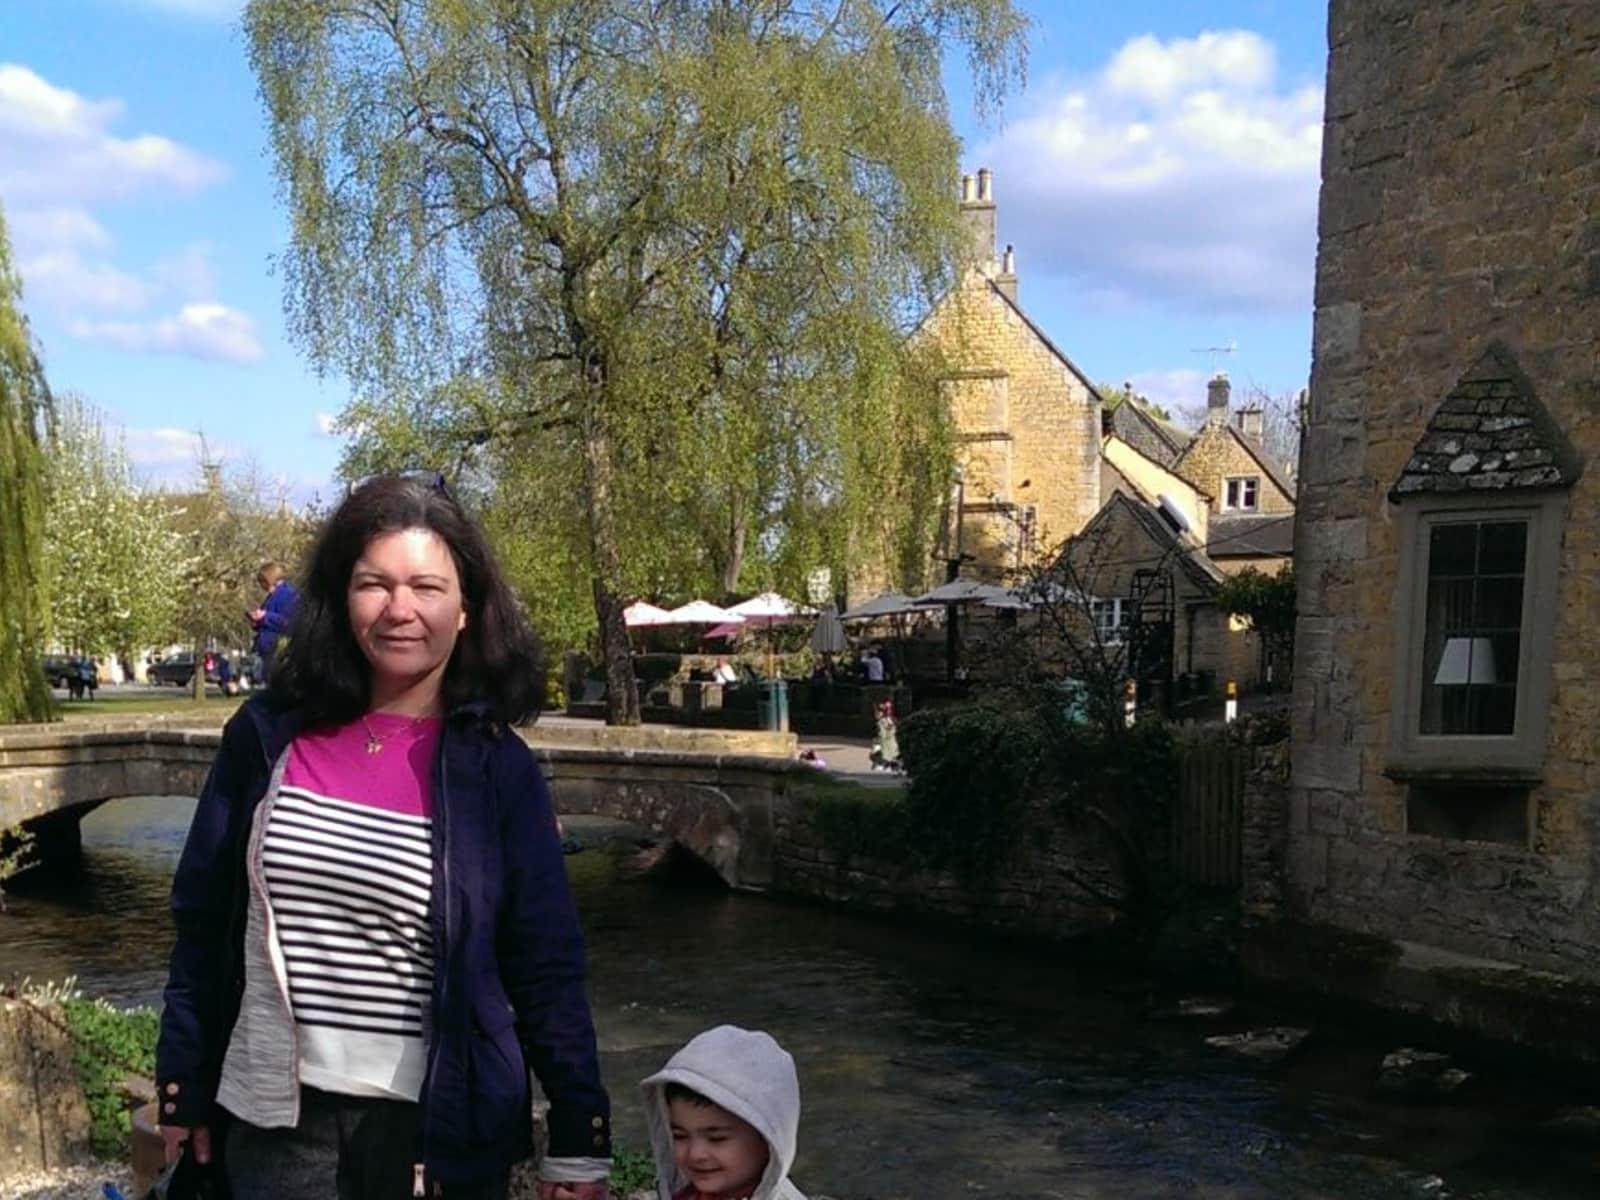 Murielle from Swindon, United Kingdom